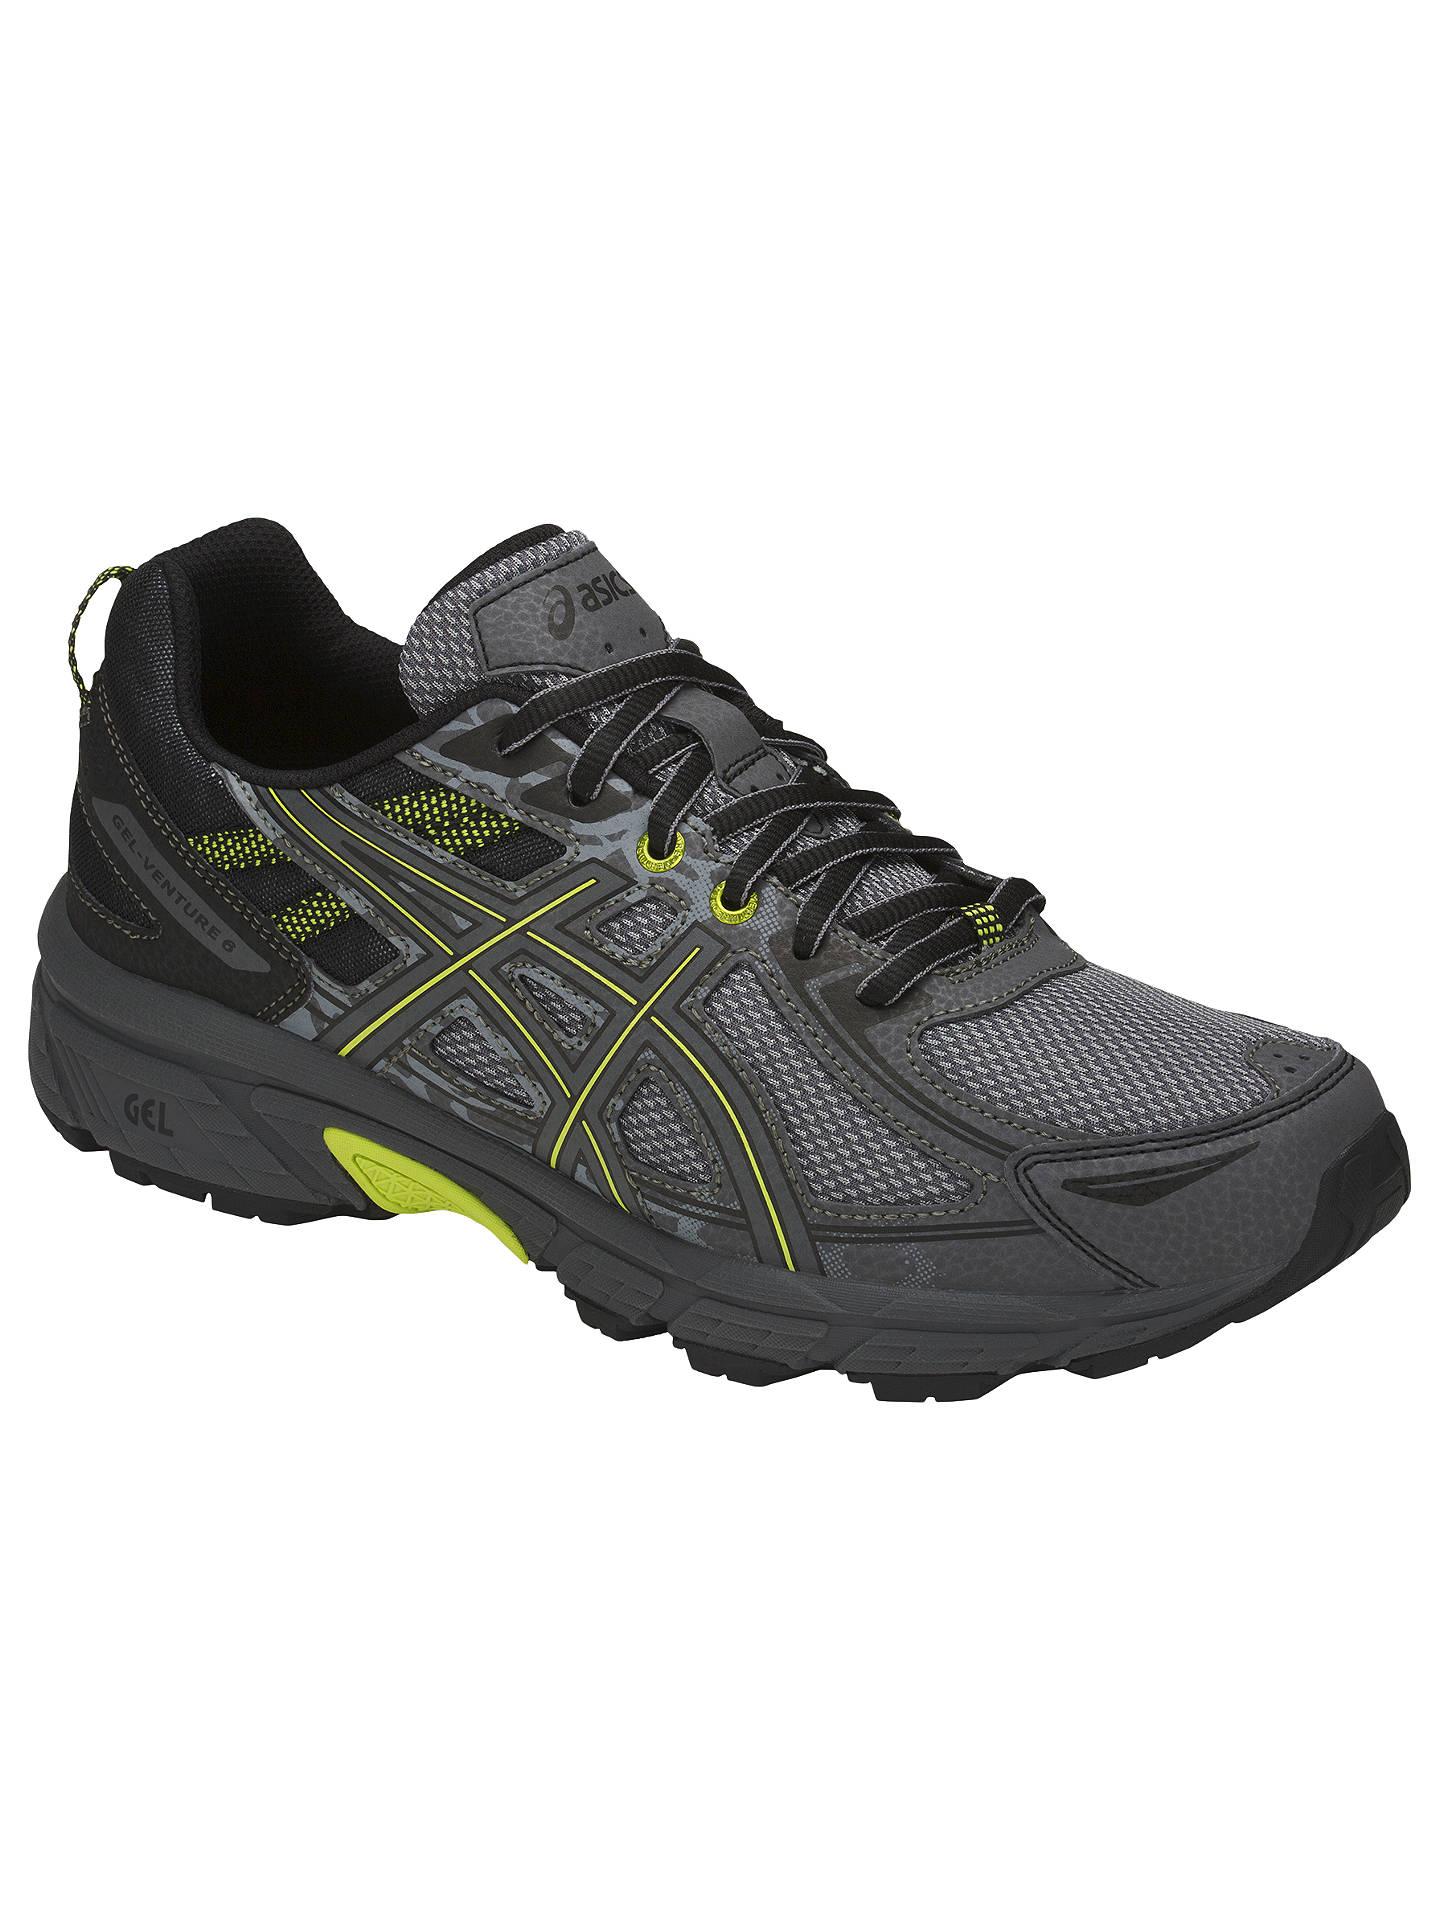 0f31f32f Asics GEL-VENTURE 6 Men's Trail Running Shoes, Stone Grey at John ...